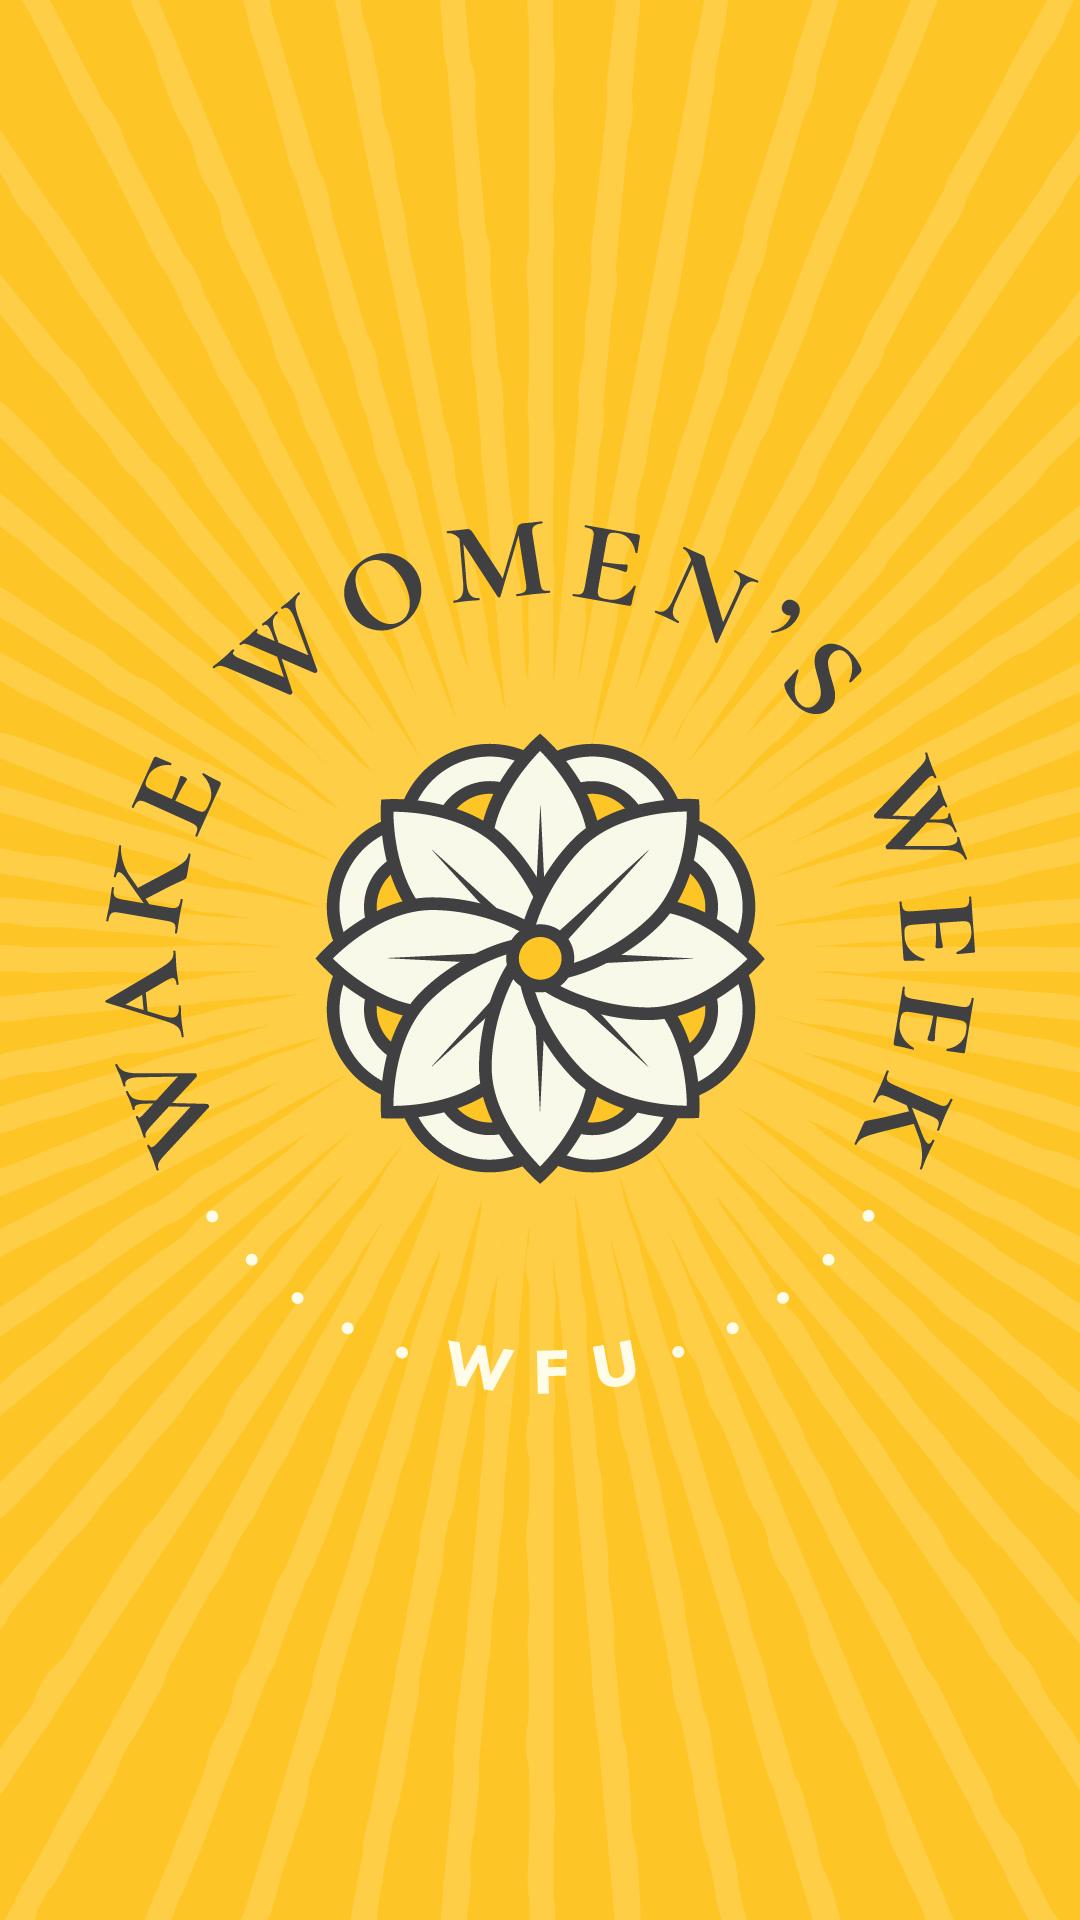 Wake Women's Week